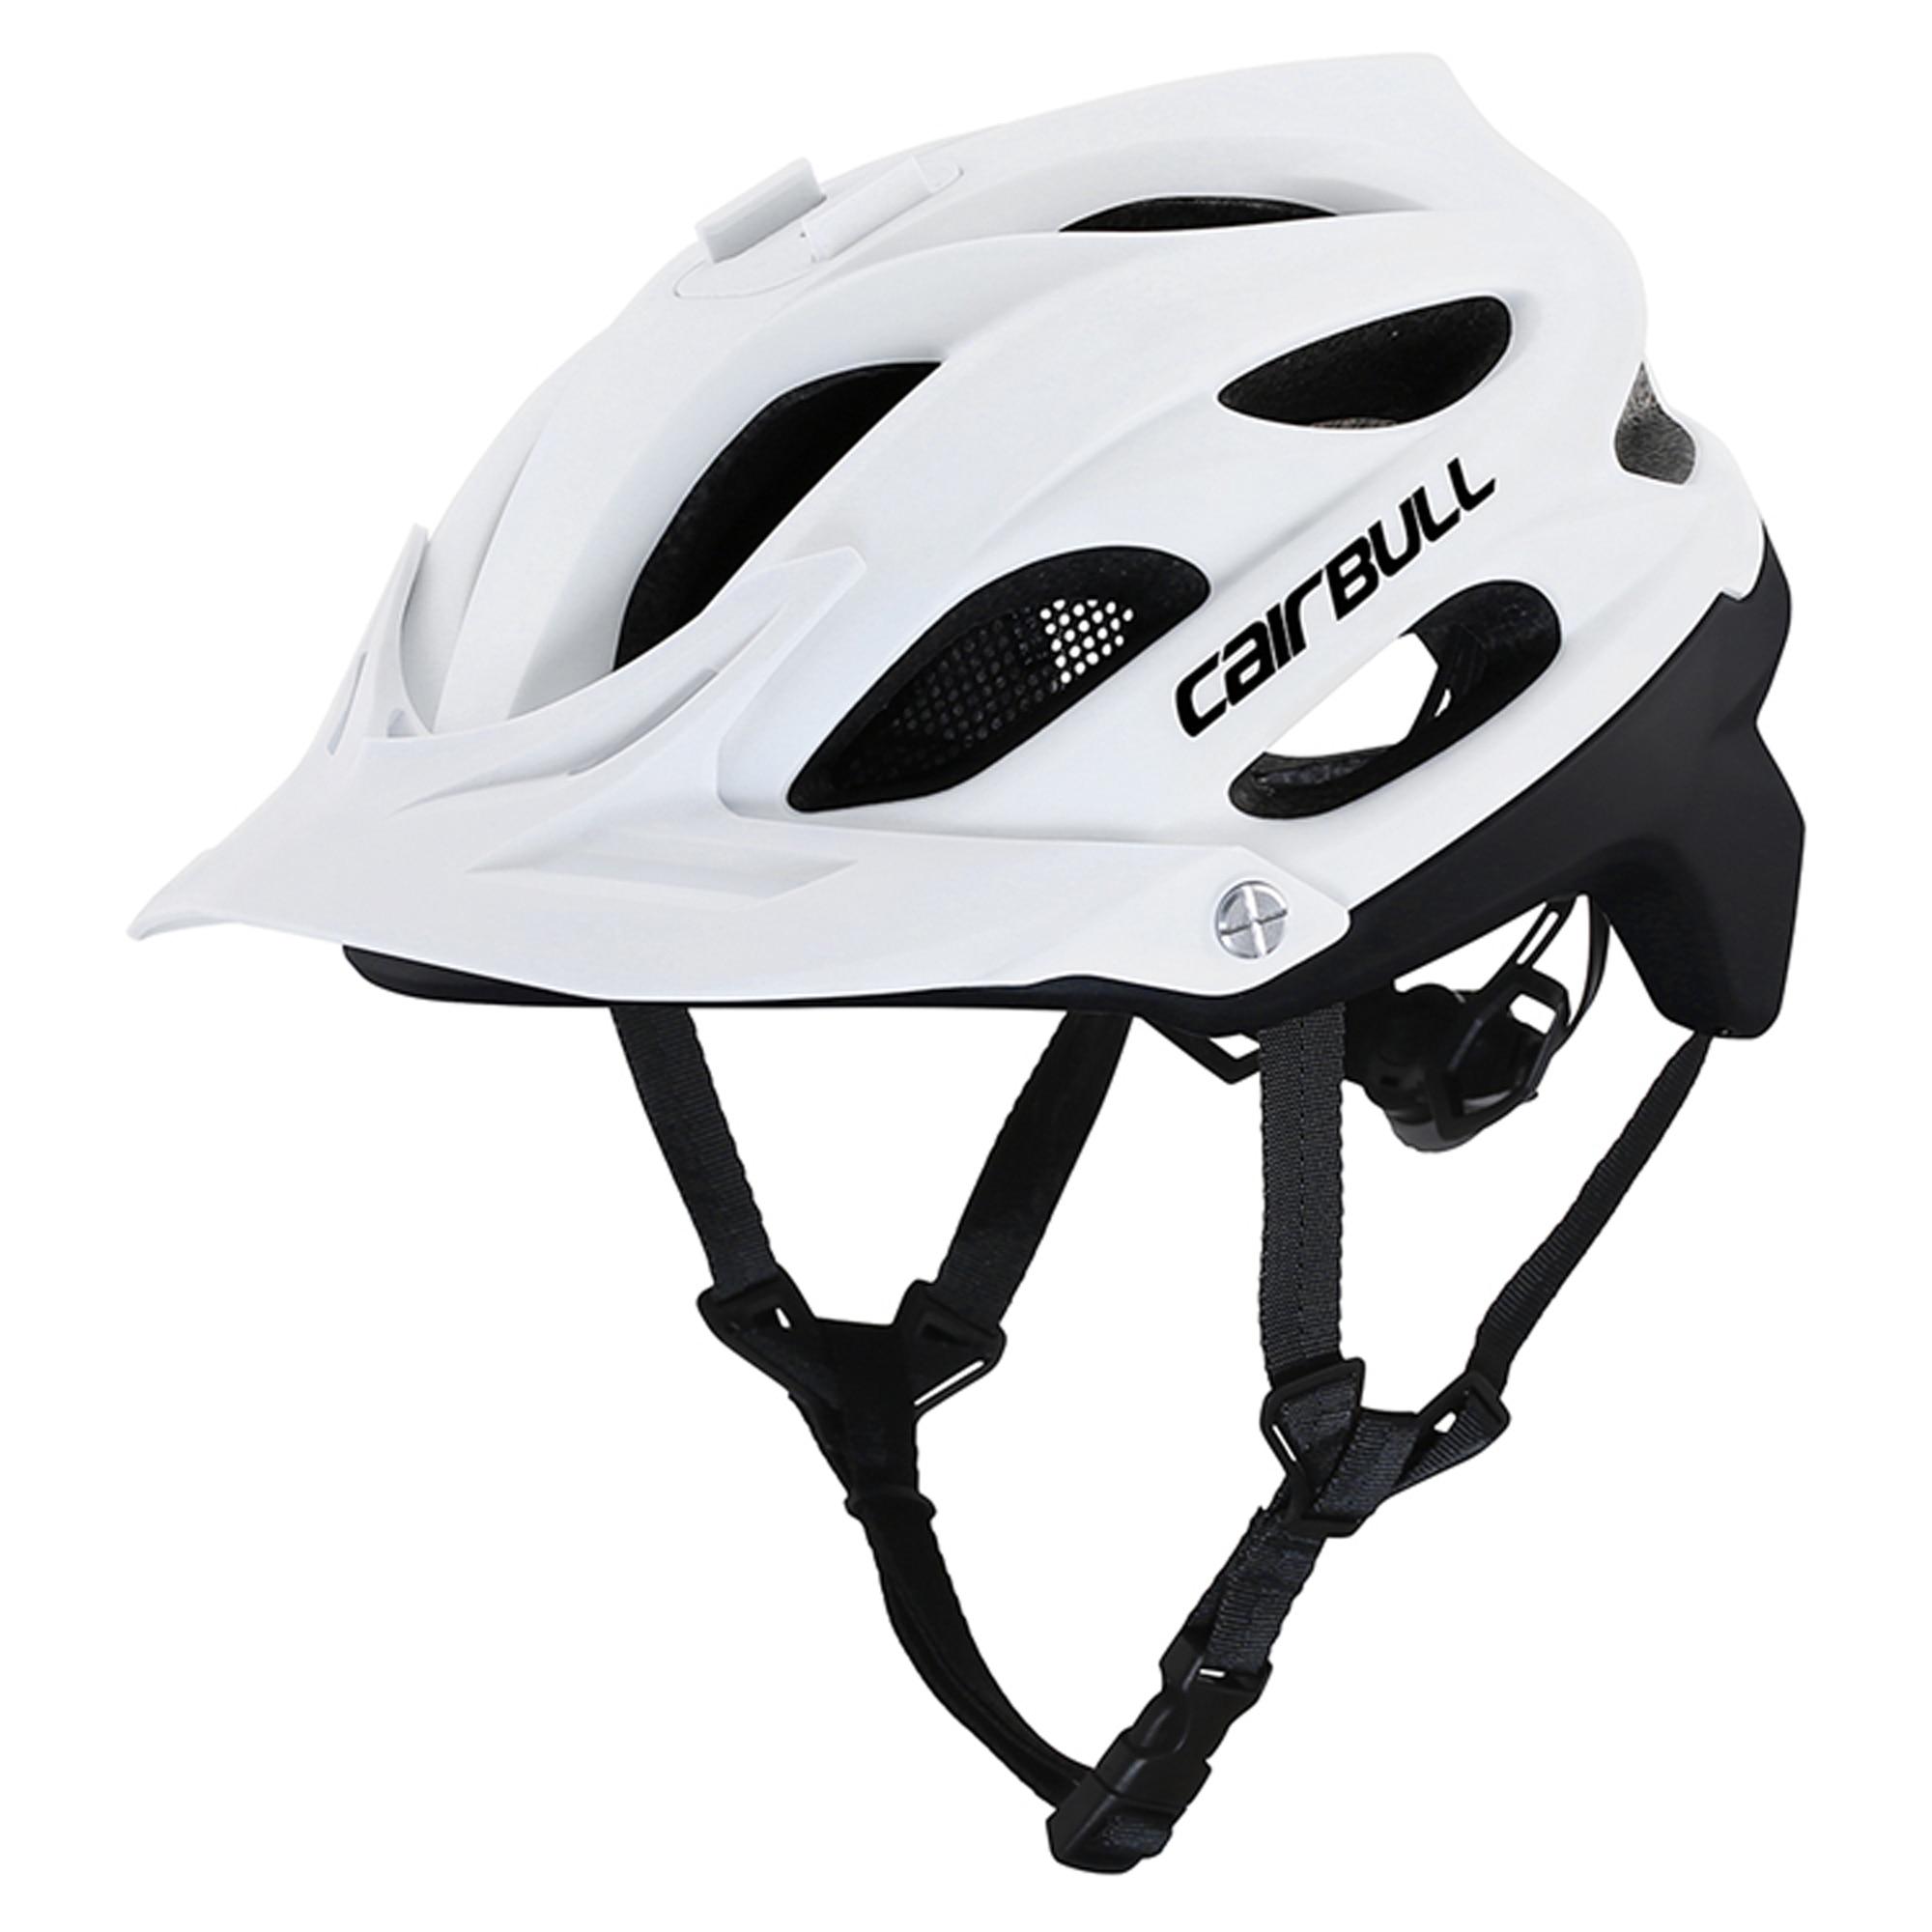 Купить с кэшбэком New Cairbull Cycling Helmets for MTB Road Bike Bicycle Helmets Cycling MTB Audlt Mountains Riding Sports Helmets 2020 Man AllSet